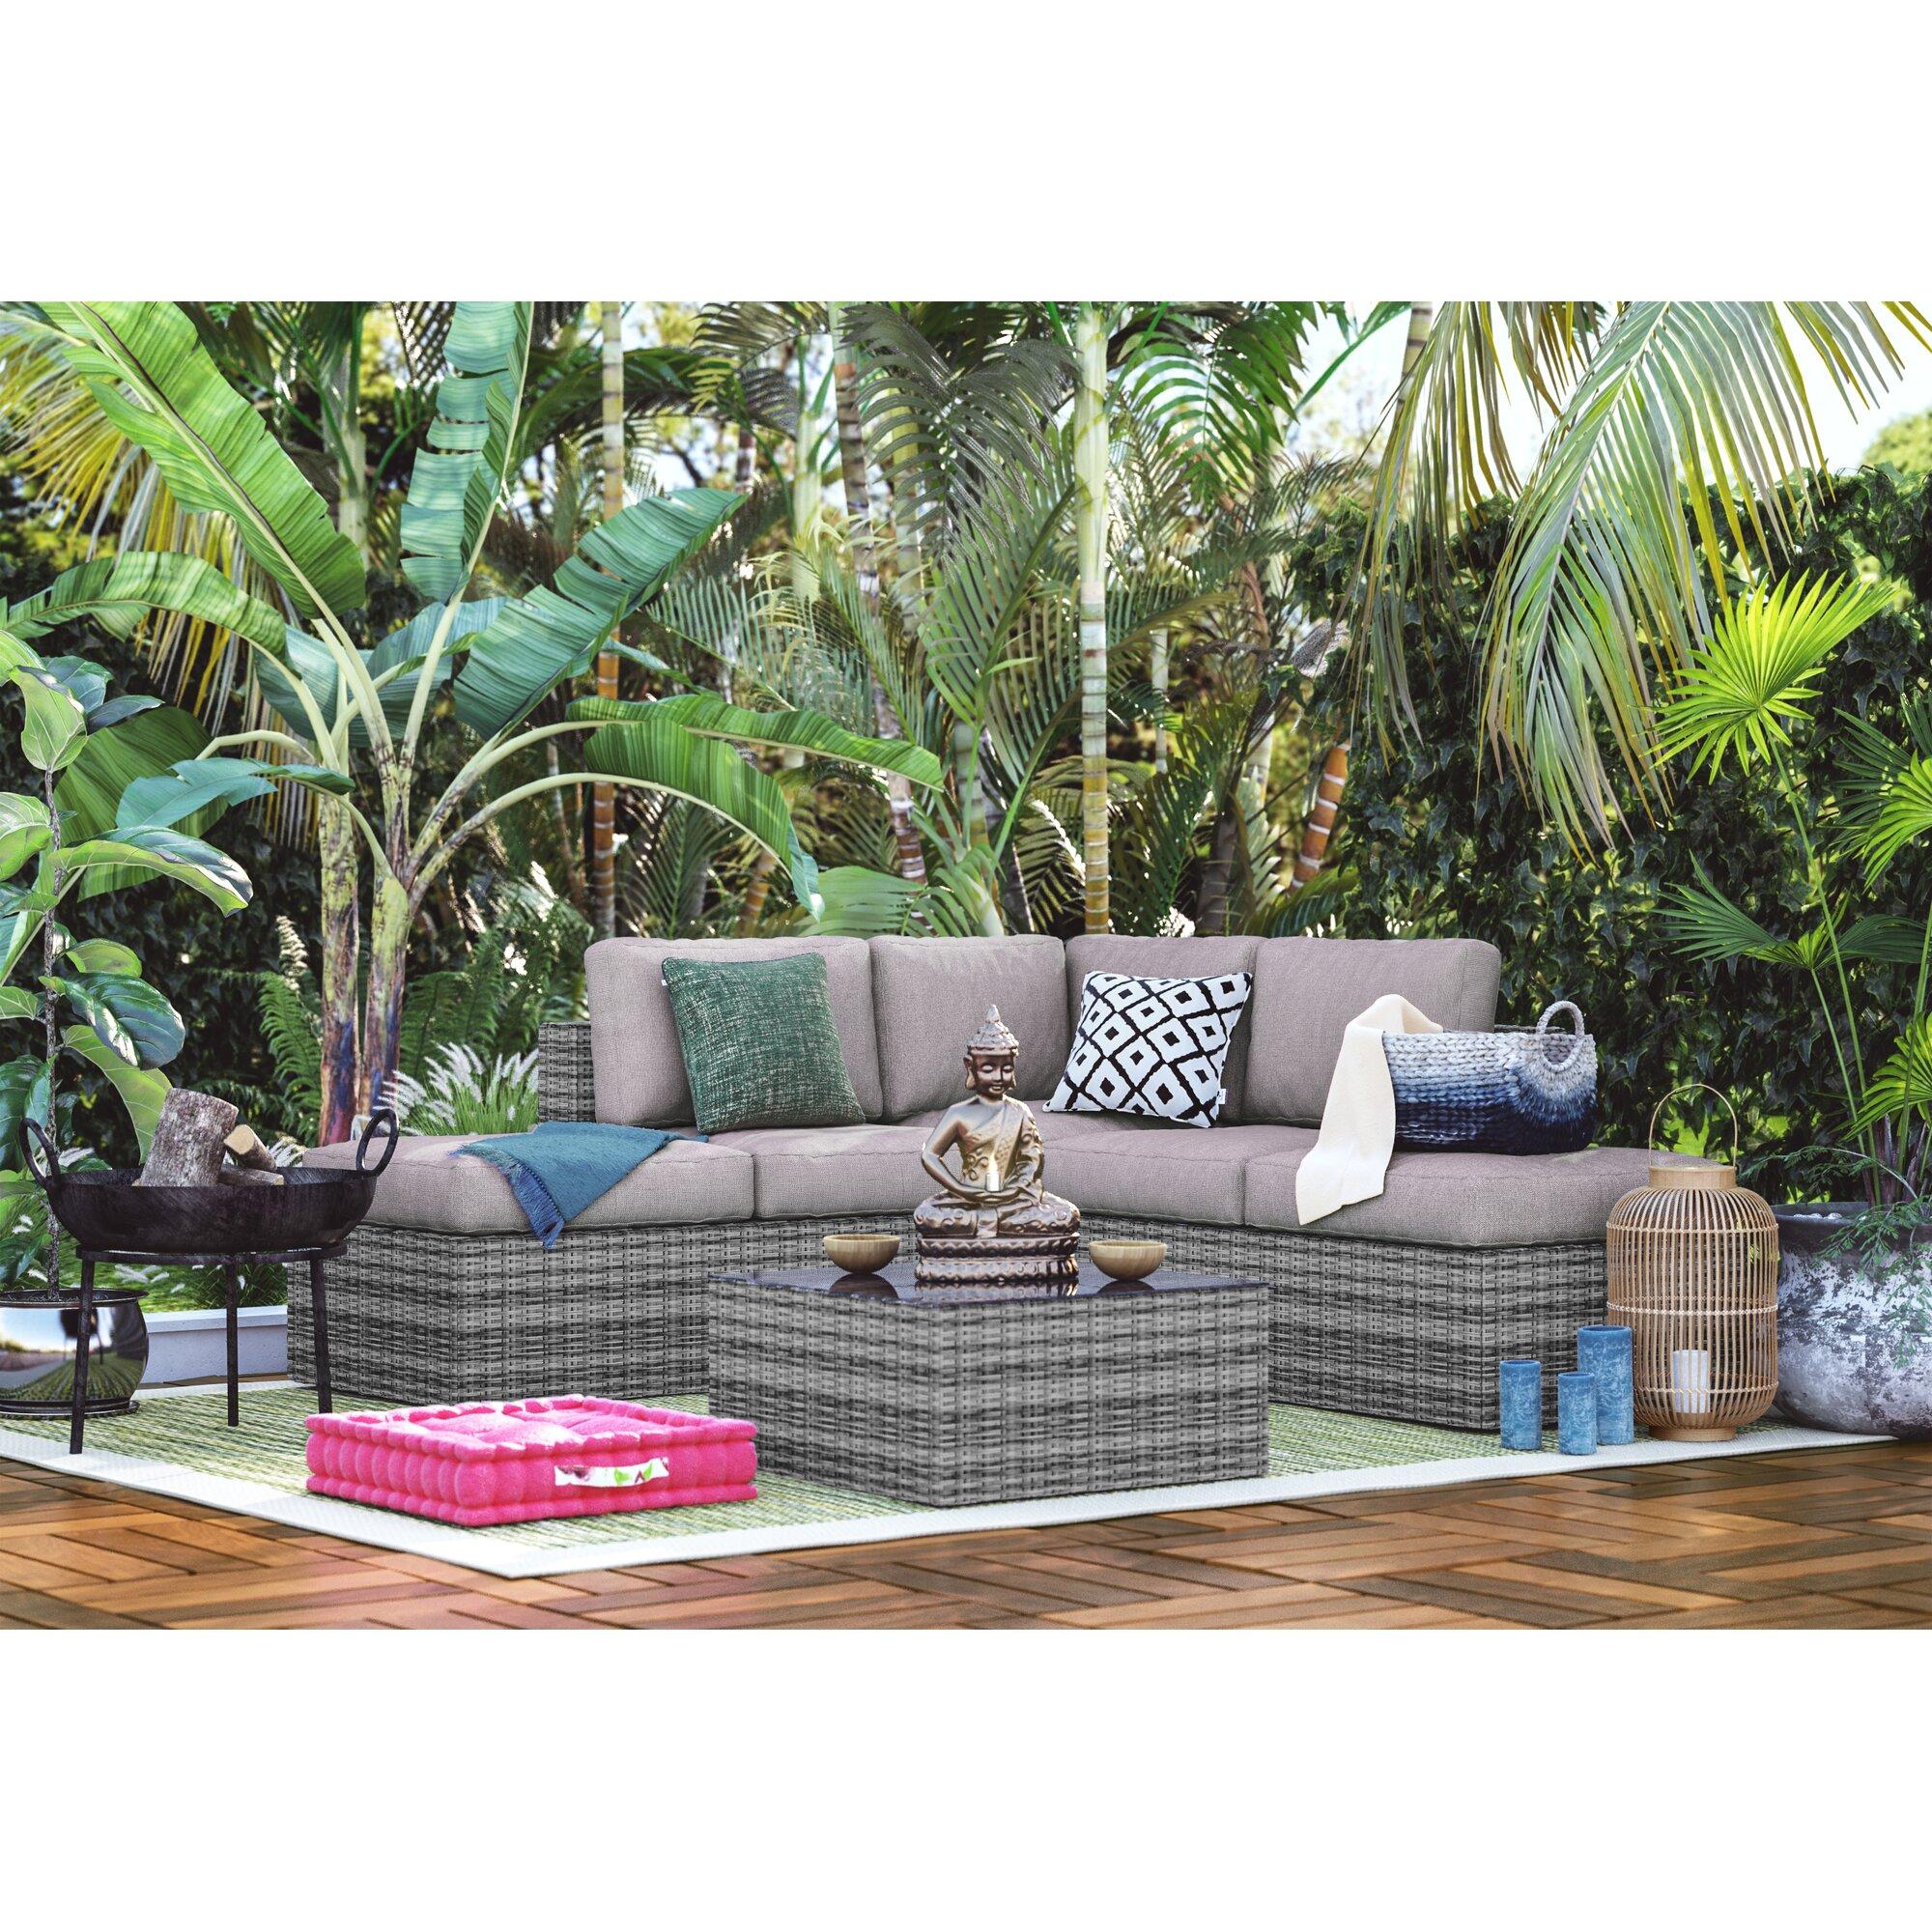 urban facettes innen au enteppich zephyr in gr n gelb. Black Bedroom Furniture Sets. Home Design Ideas